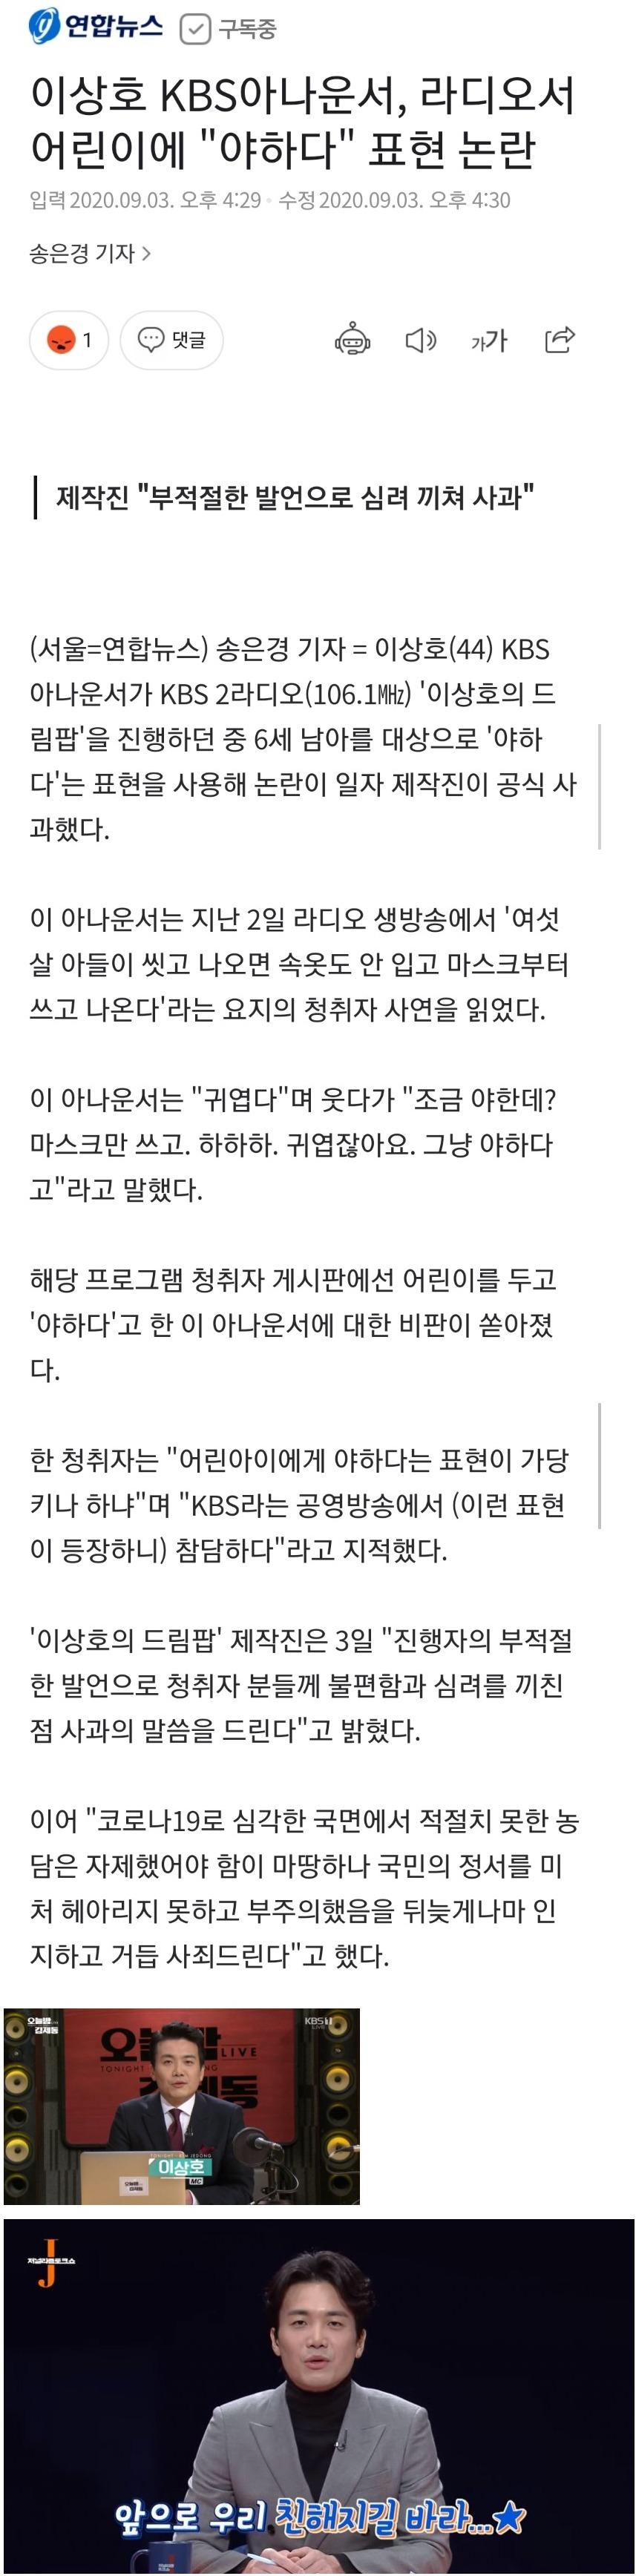 KBS 아나운서 클라스